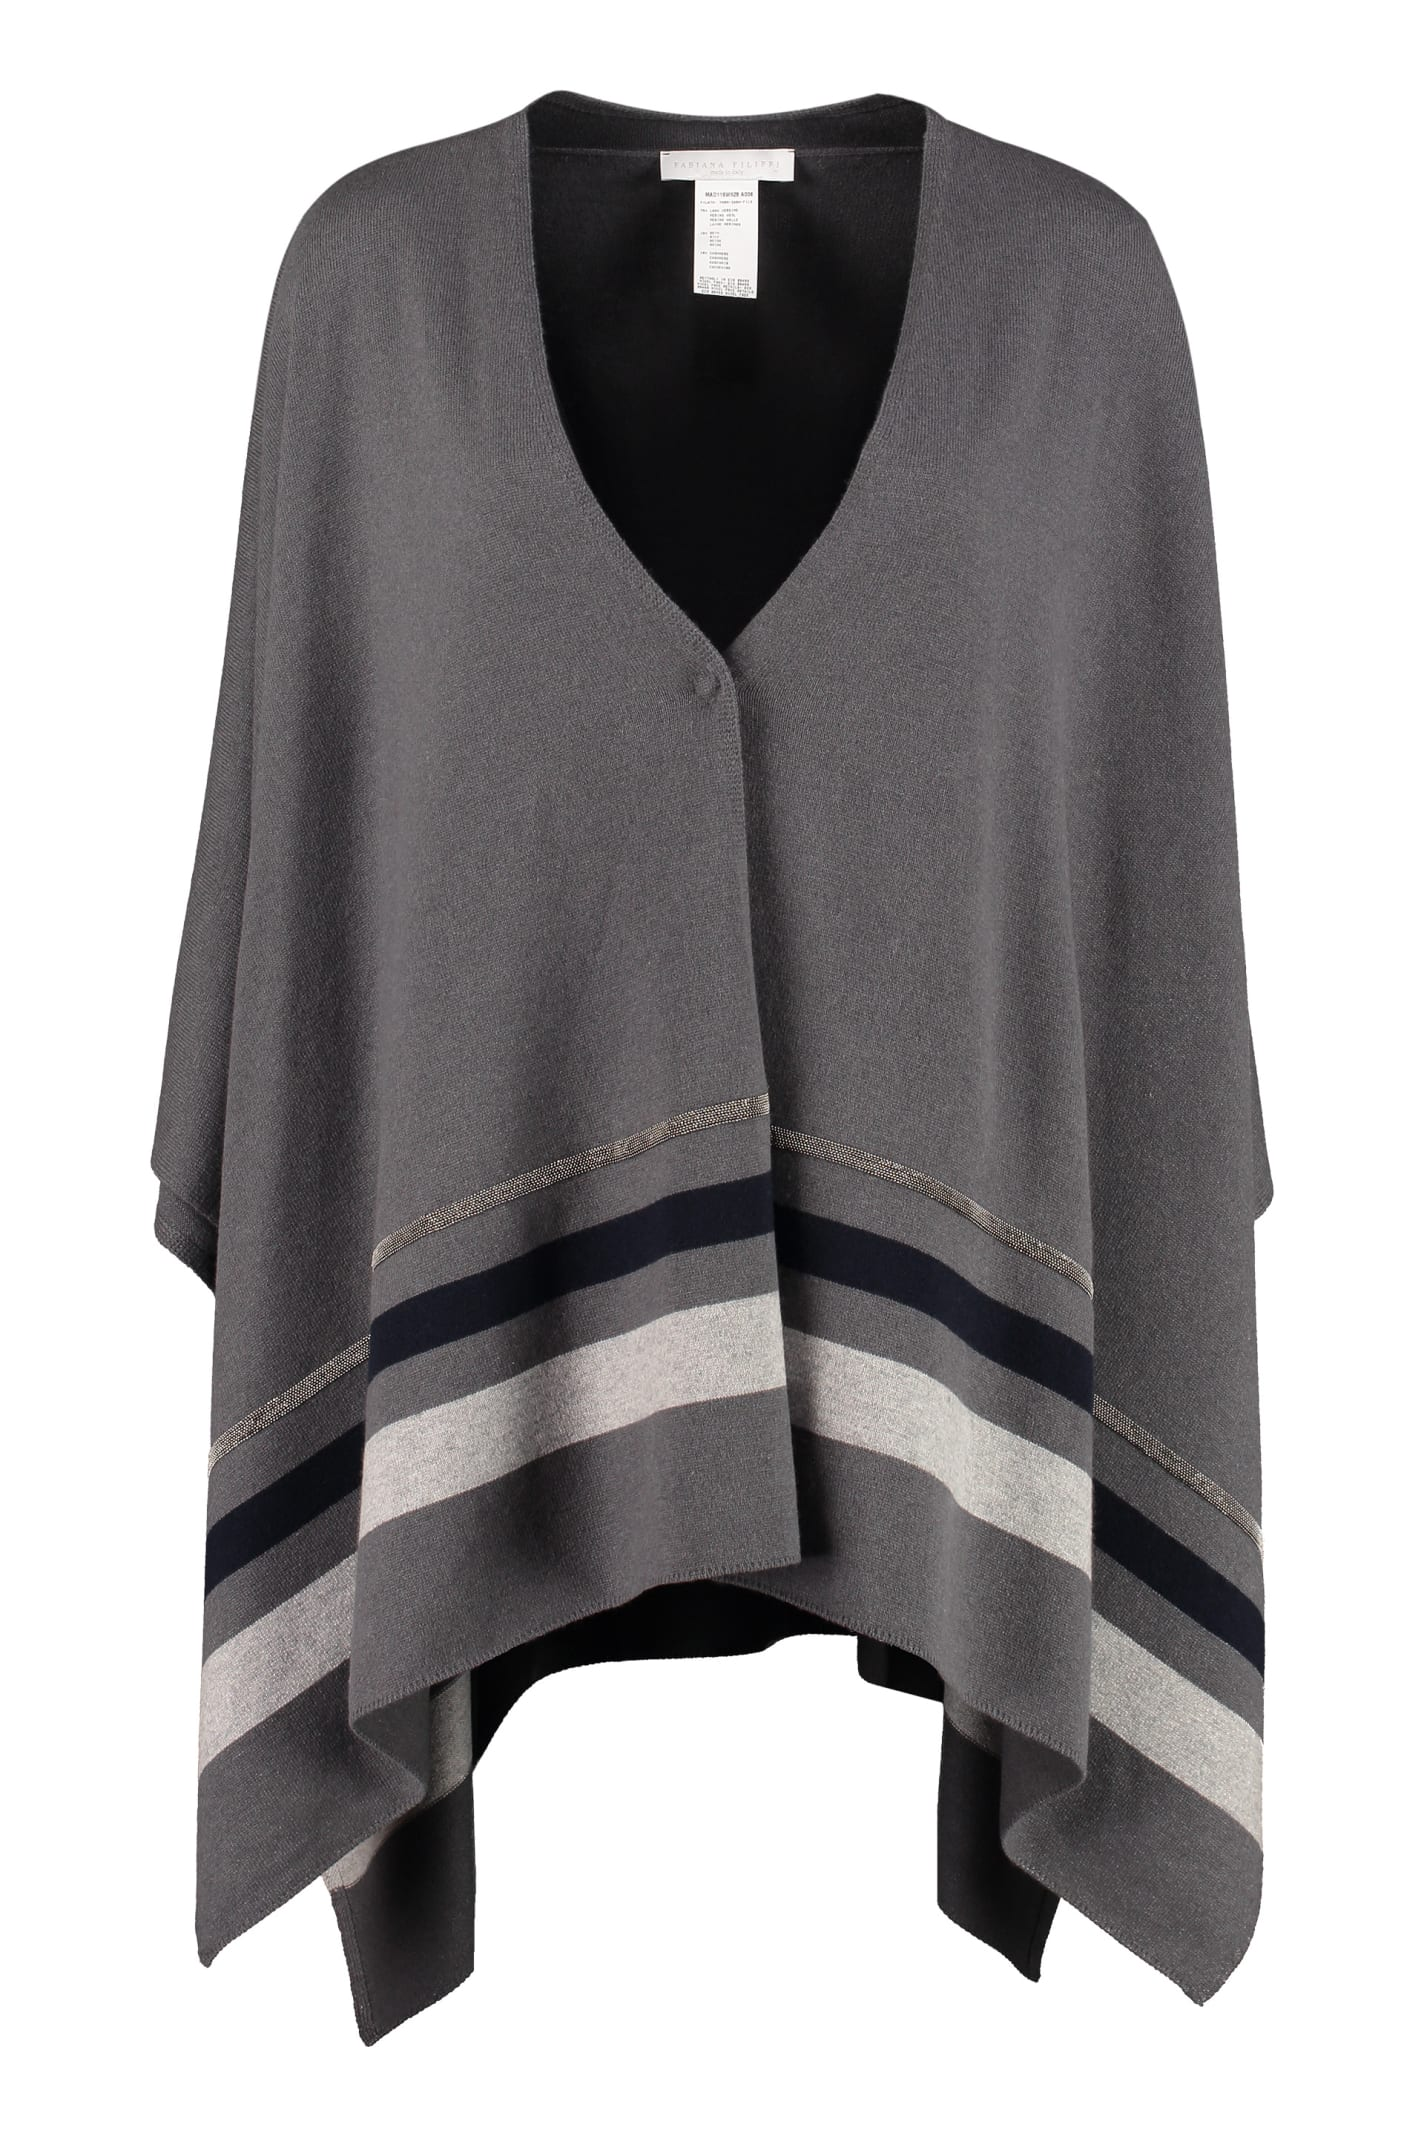 Fabiana Filippi Wool, Silk And Cashmere Cape